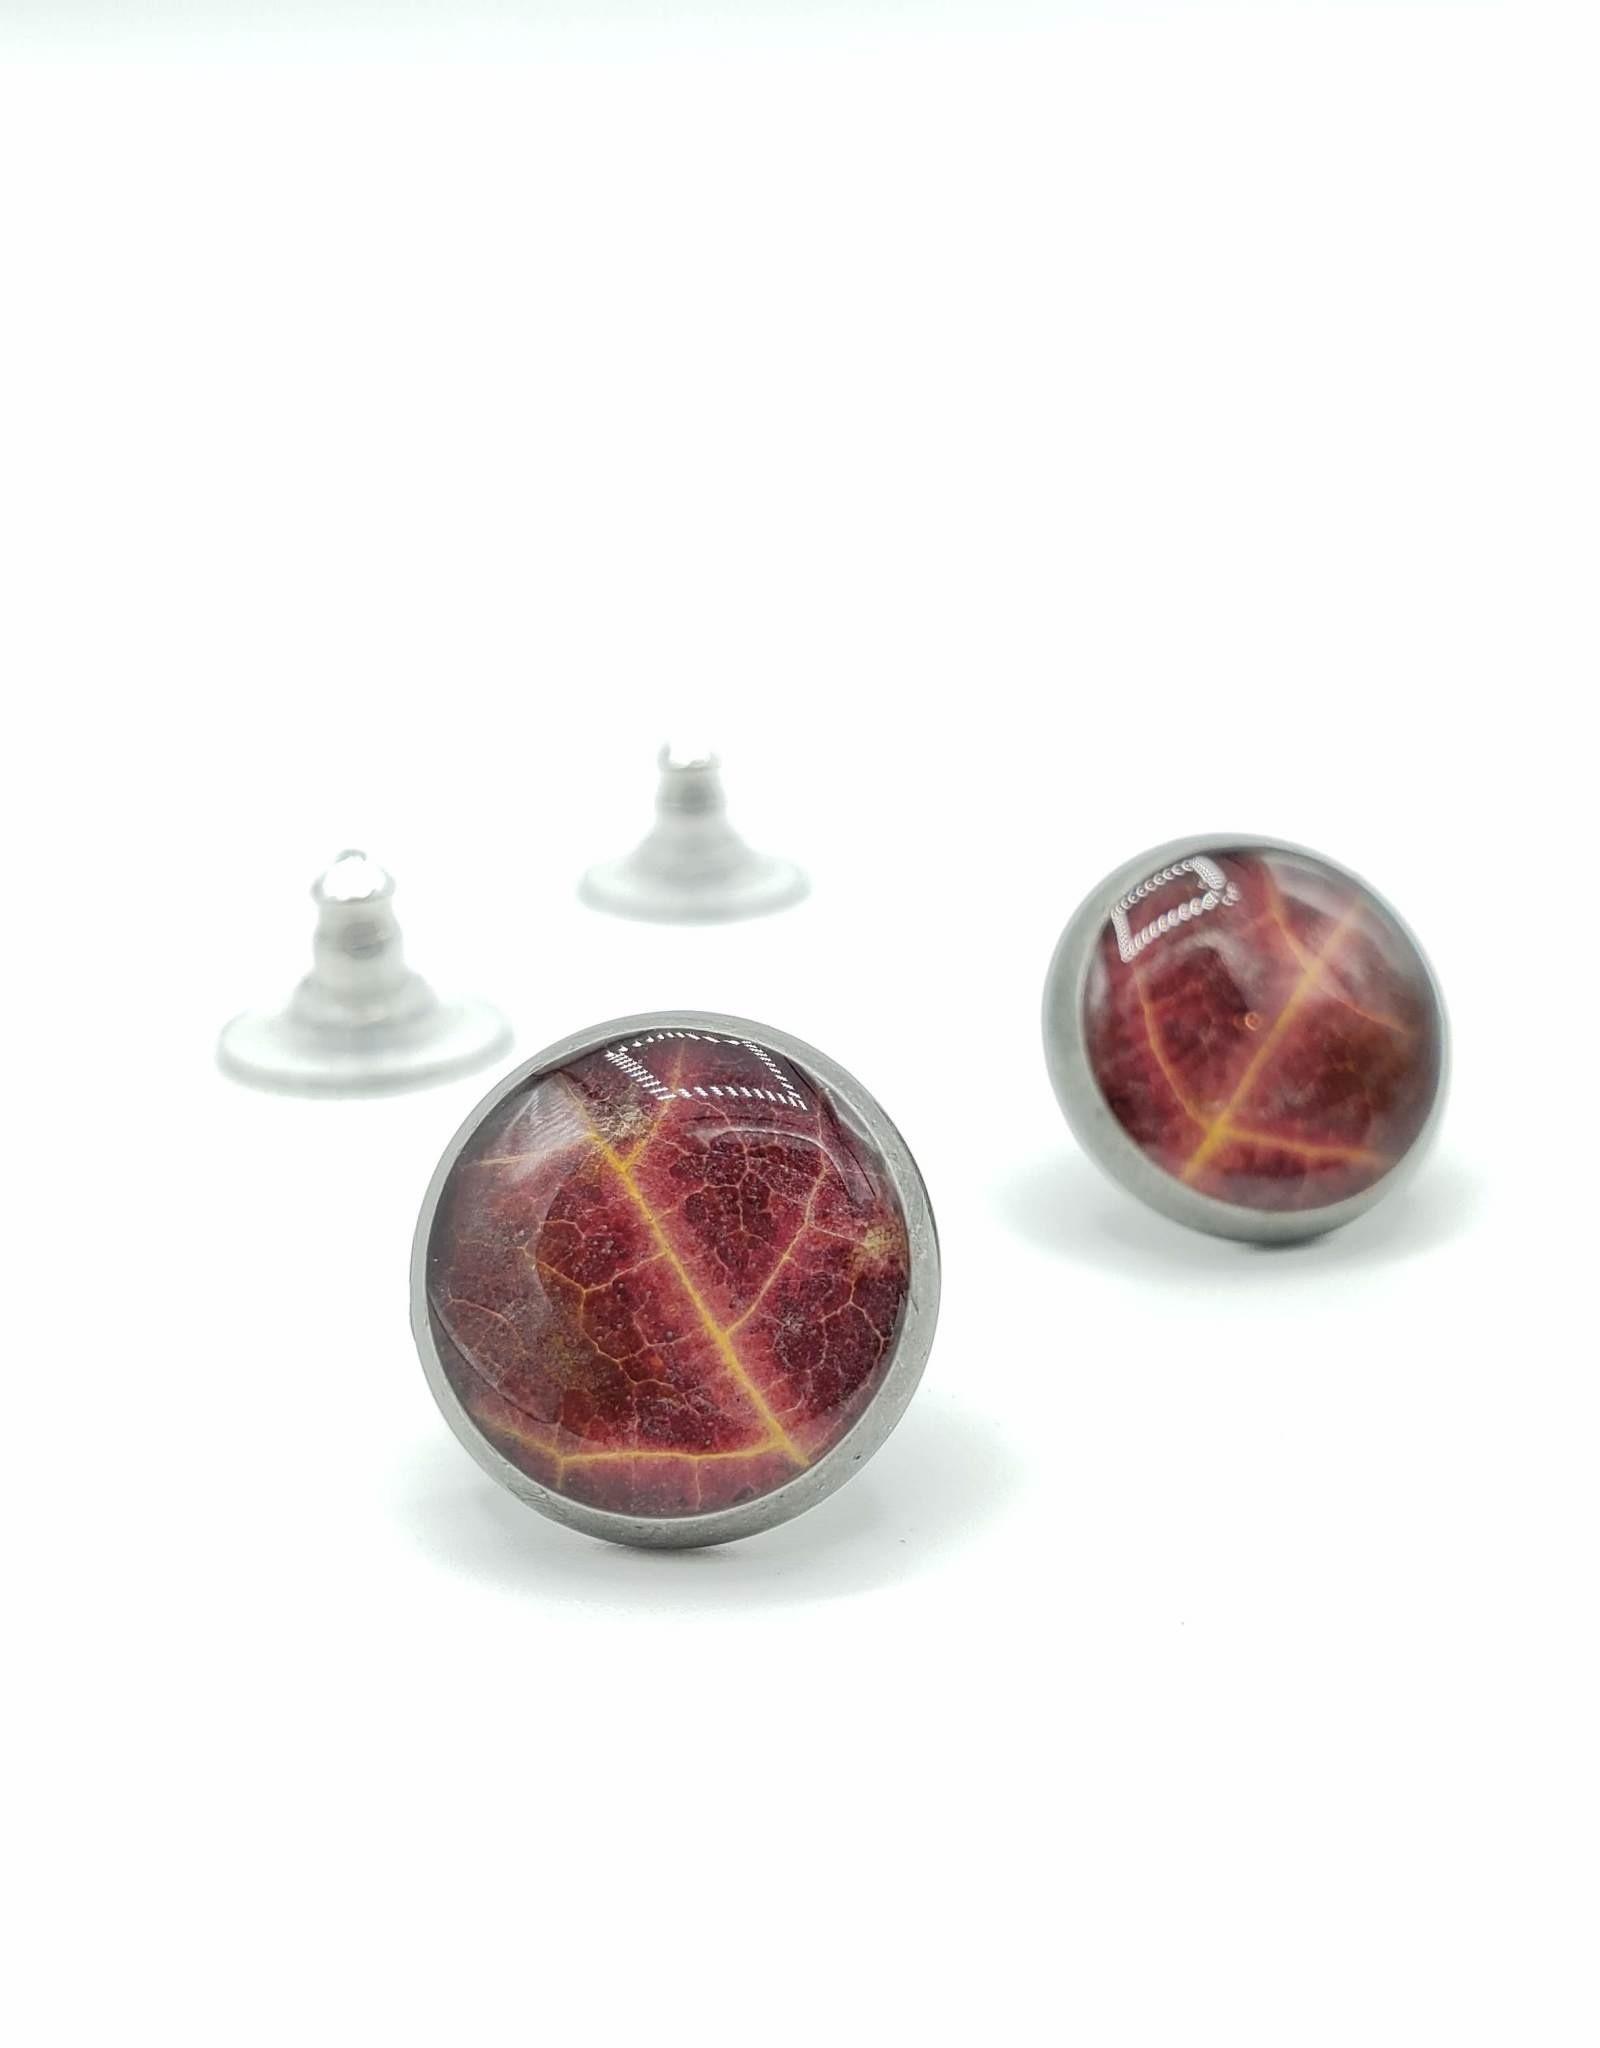 by Kali Red Leaf in Resin Post Earrings, Antiqued Silver - by Kali